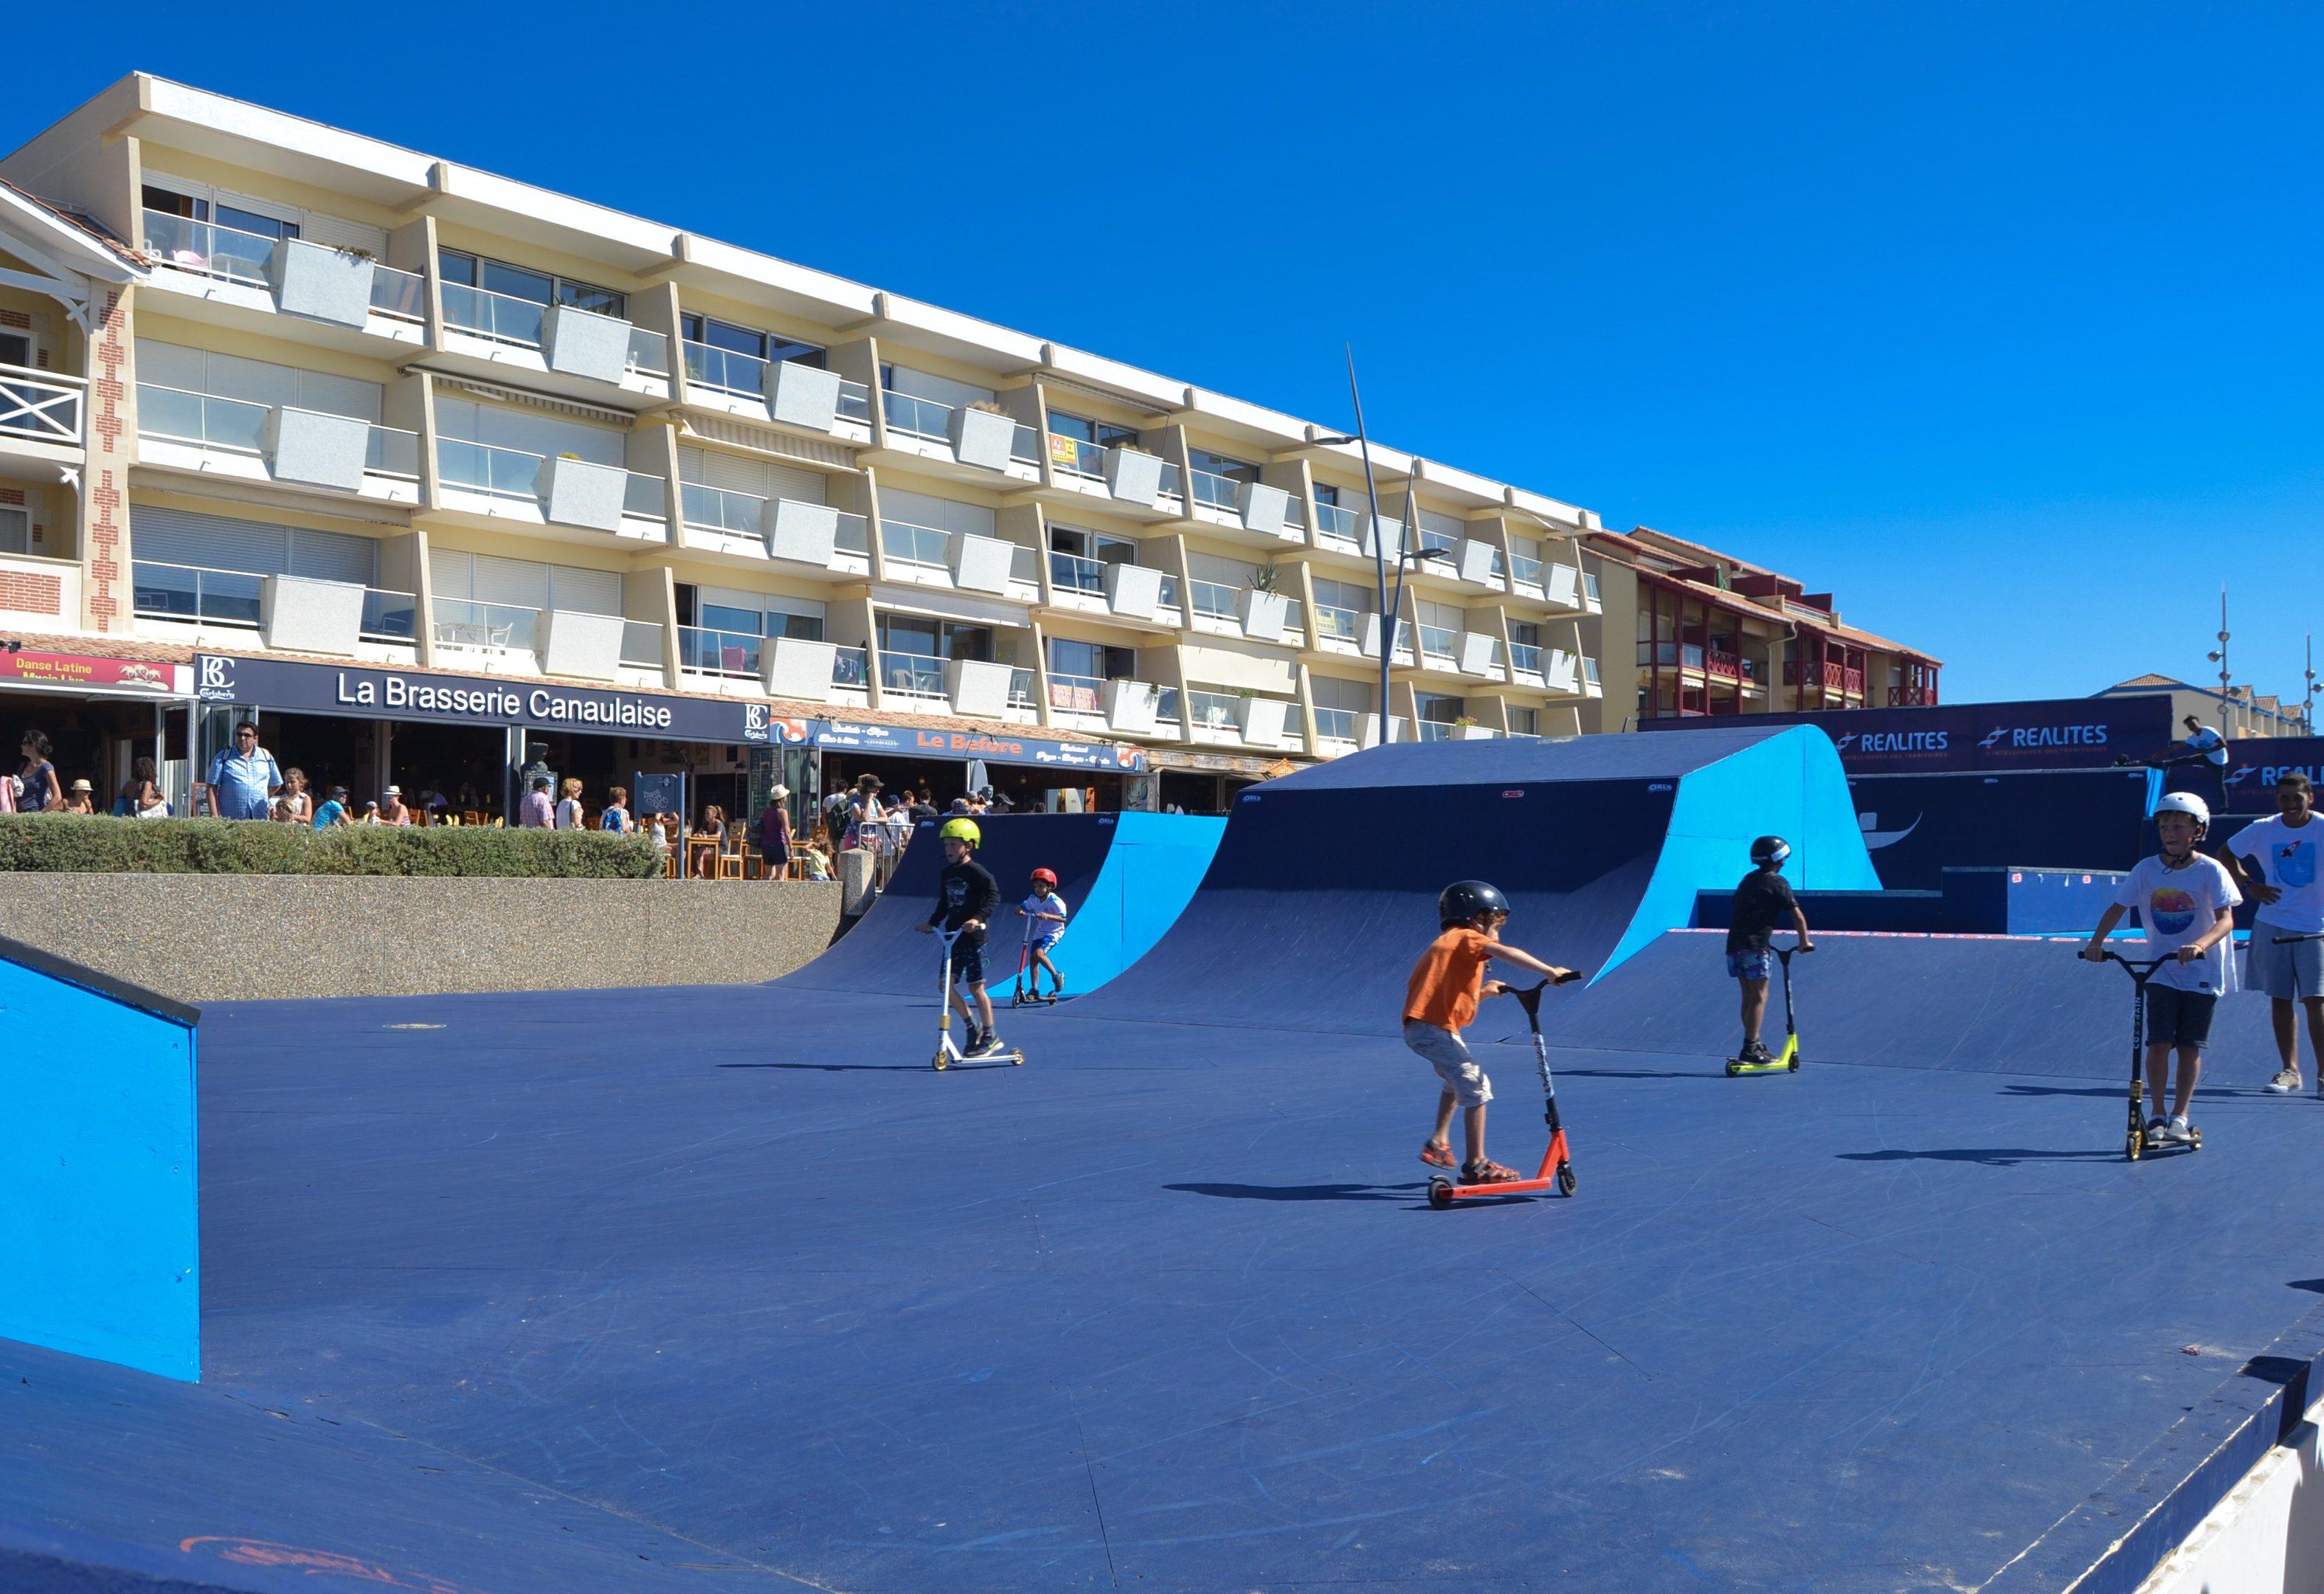 caraibos-lacanau-pro-surf-blog-voyage-les-ptits-touristes-wsl-skatepark